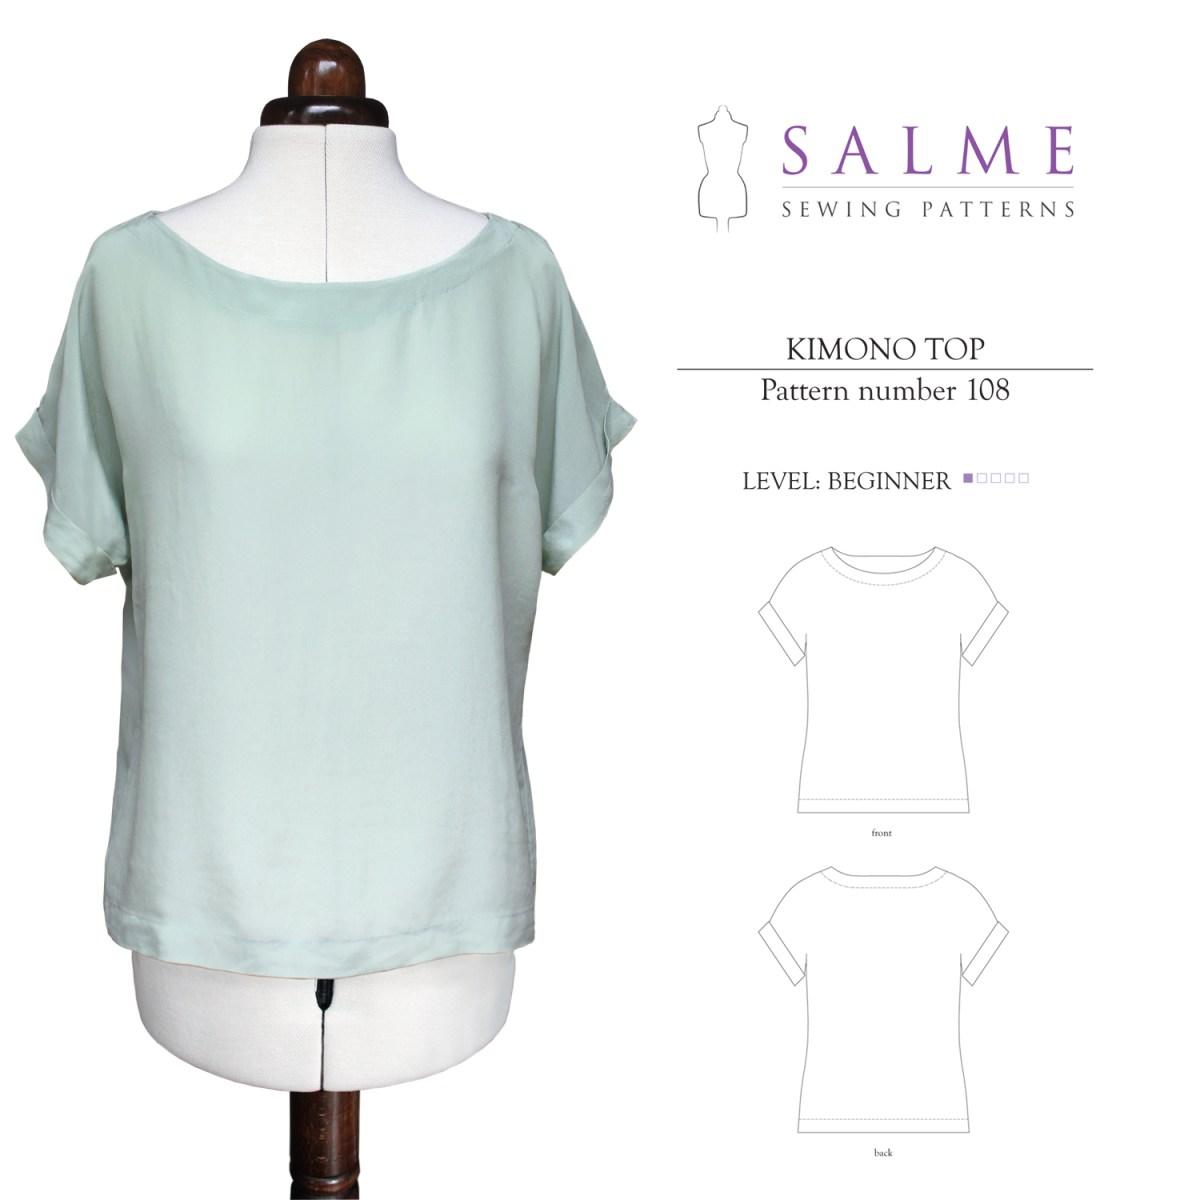 Beginner Sewing Patterns Salme Sewing Patterns 108 Kimono Top Downloadable Pattern